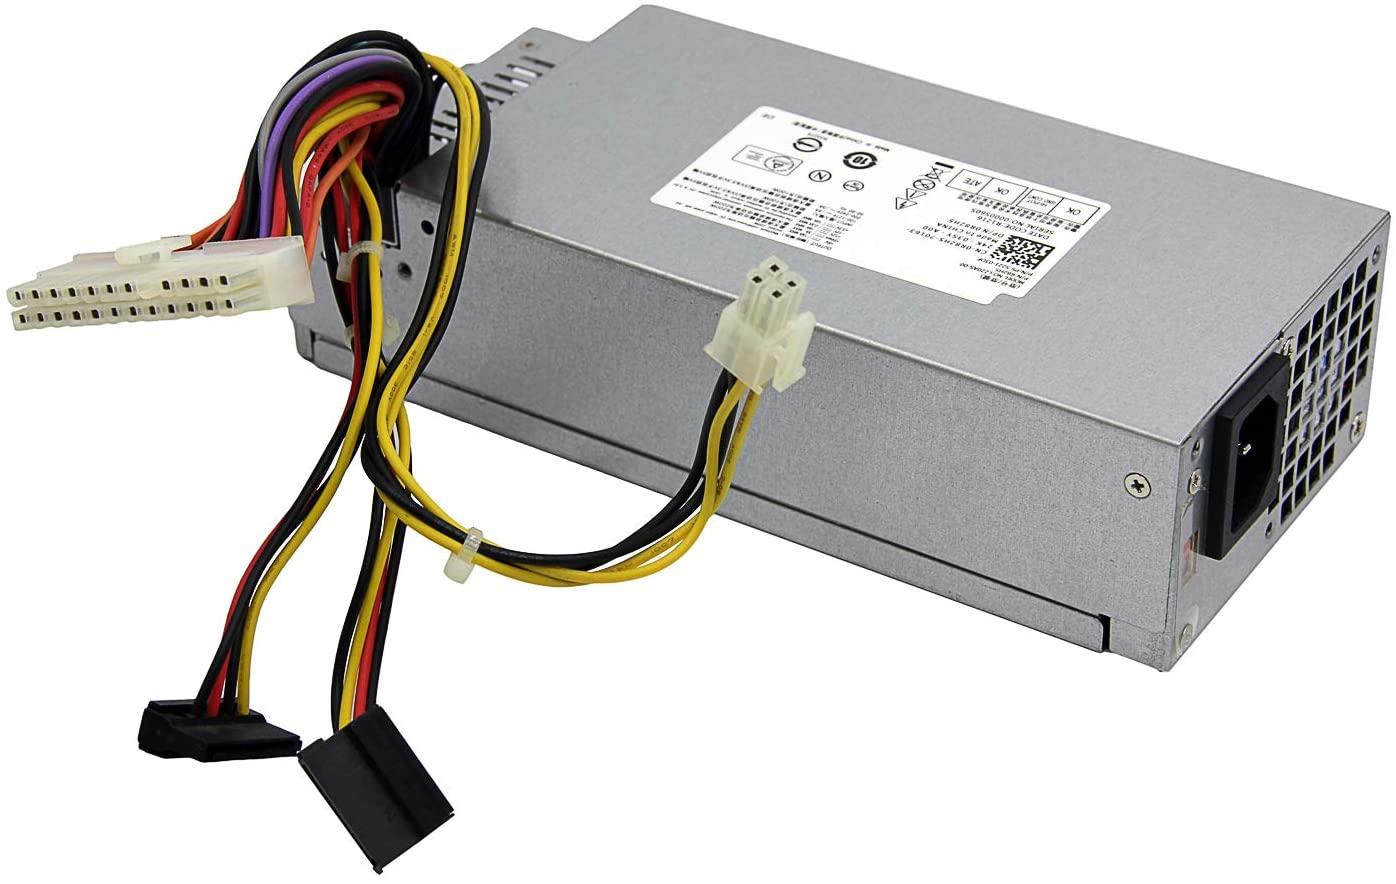 220W L220AS-00 CPB09-D220R Power Supply for Dell Inspiron 3647 660s Vostro 270 Gateway SX2300 Aspire X1200 X1300 Veriton X2110 X2610 eMachines L1200 L1210 Series,P/N: R82HS R82H5 R5RV4